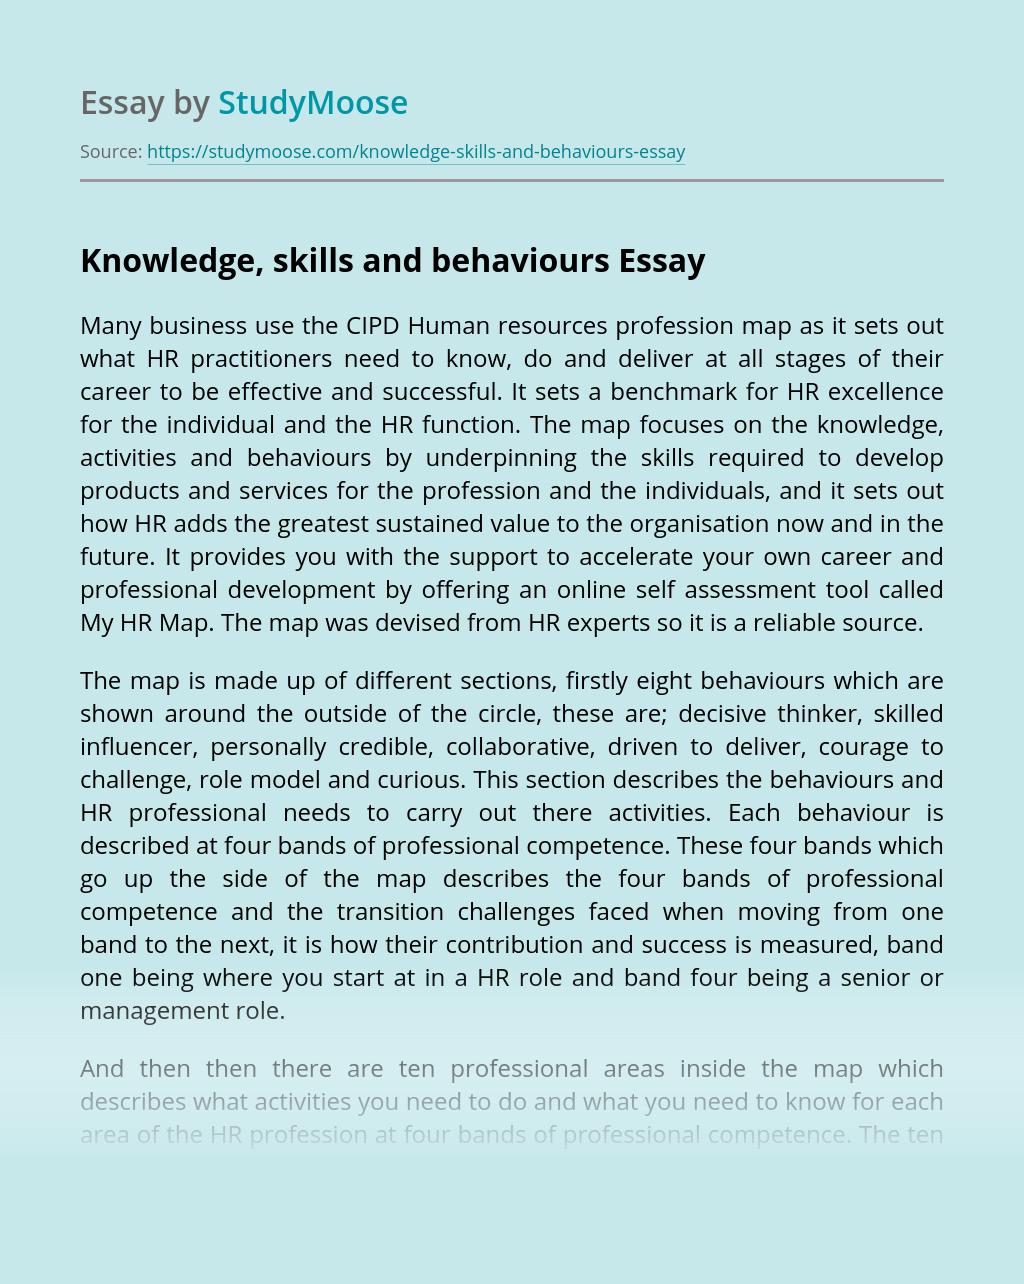 Knowledge, skills and behaviours